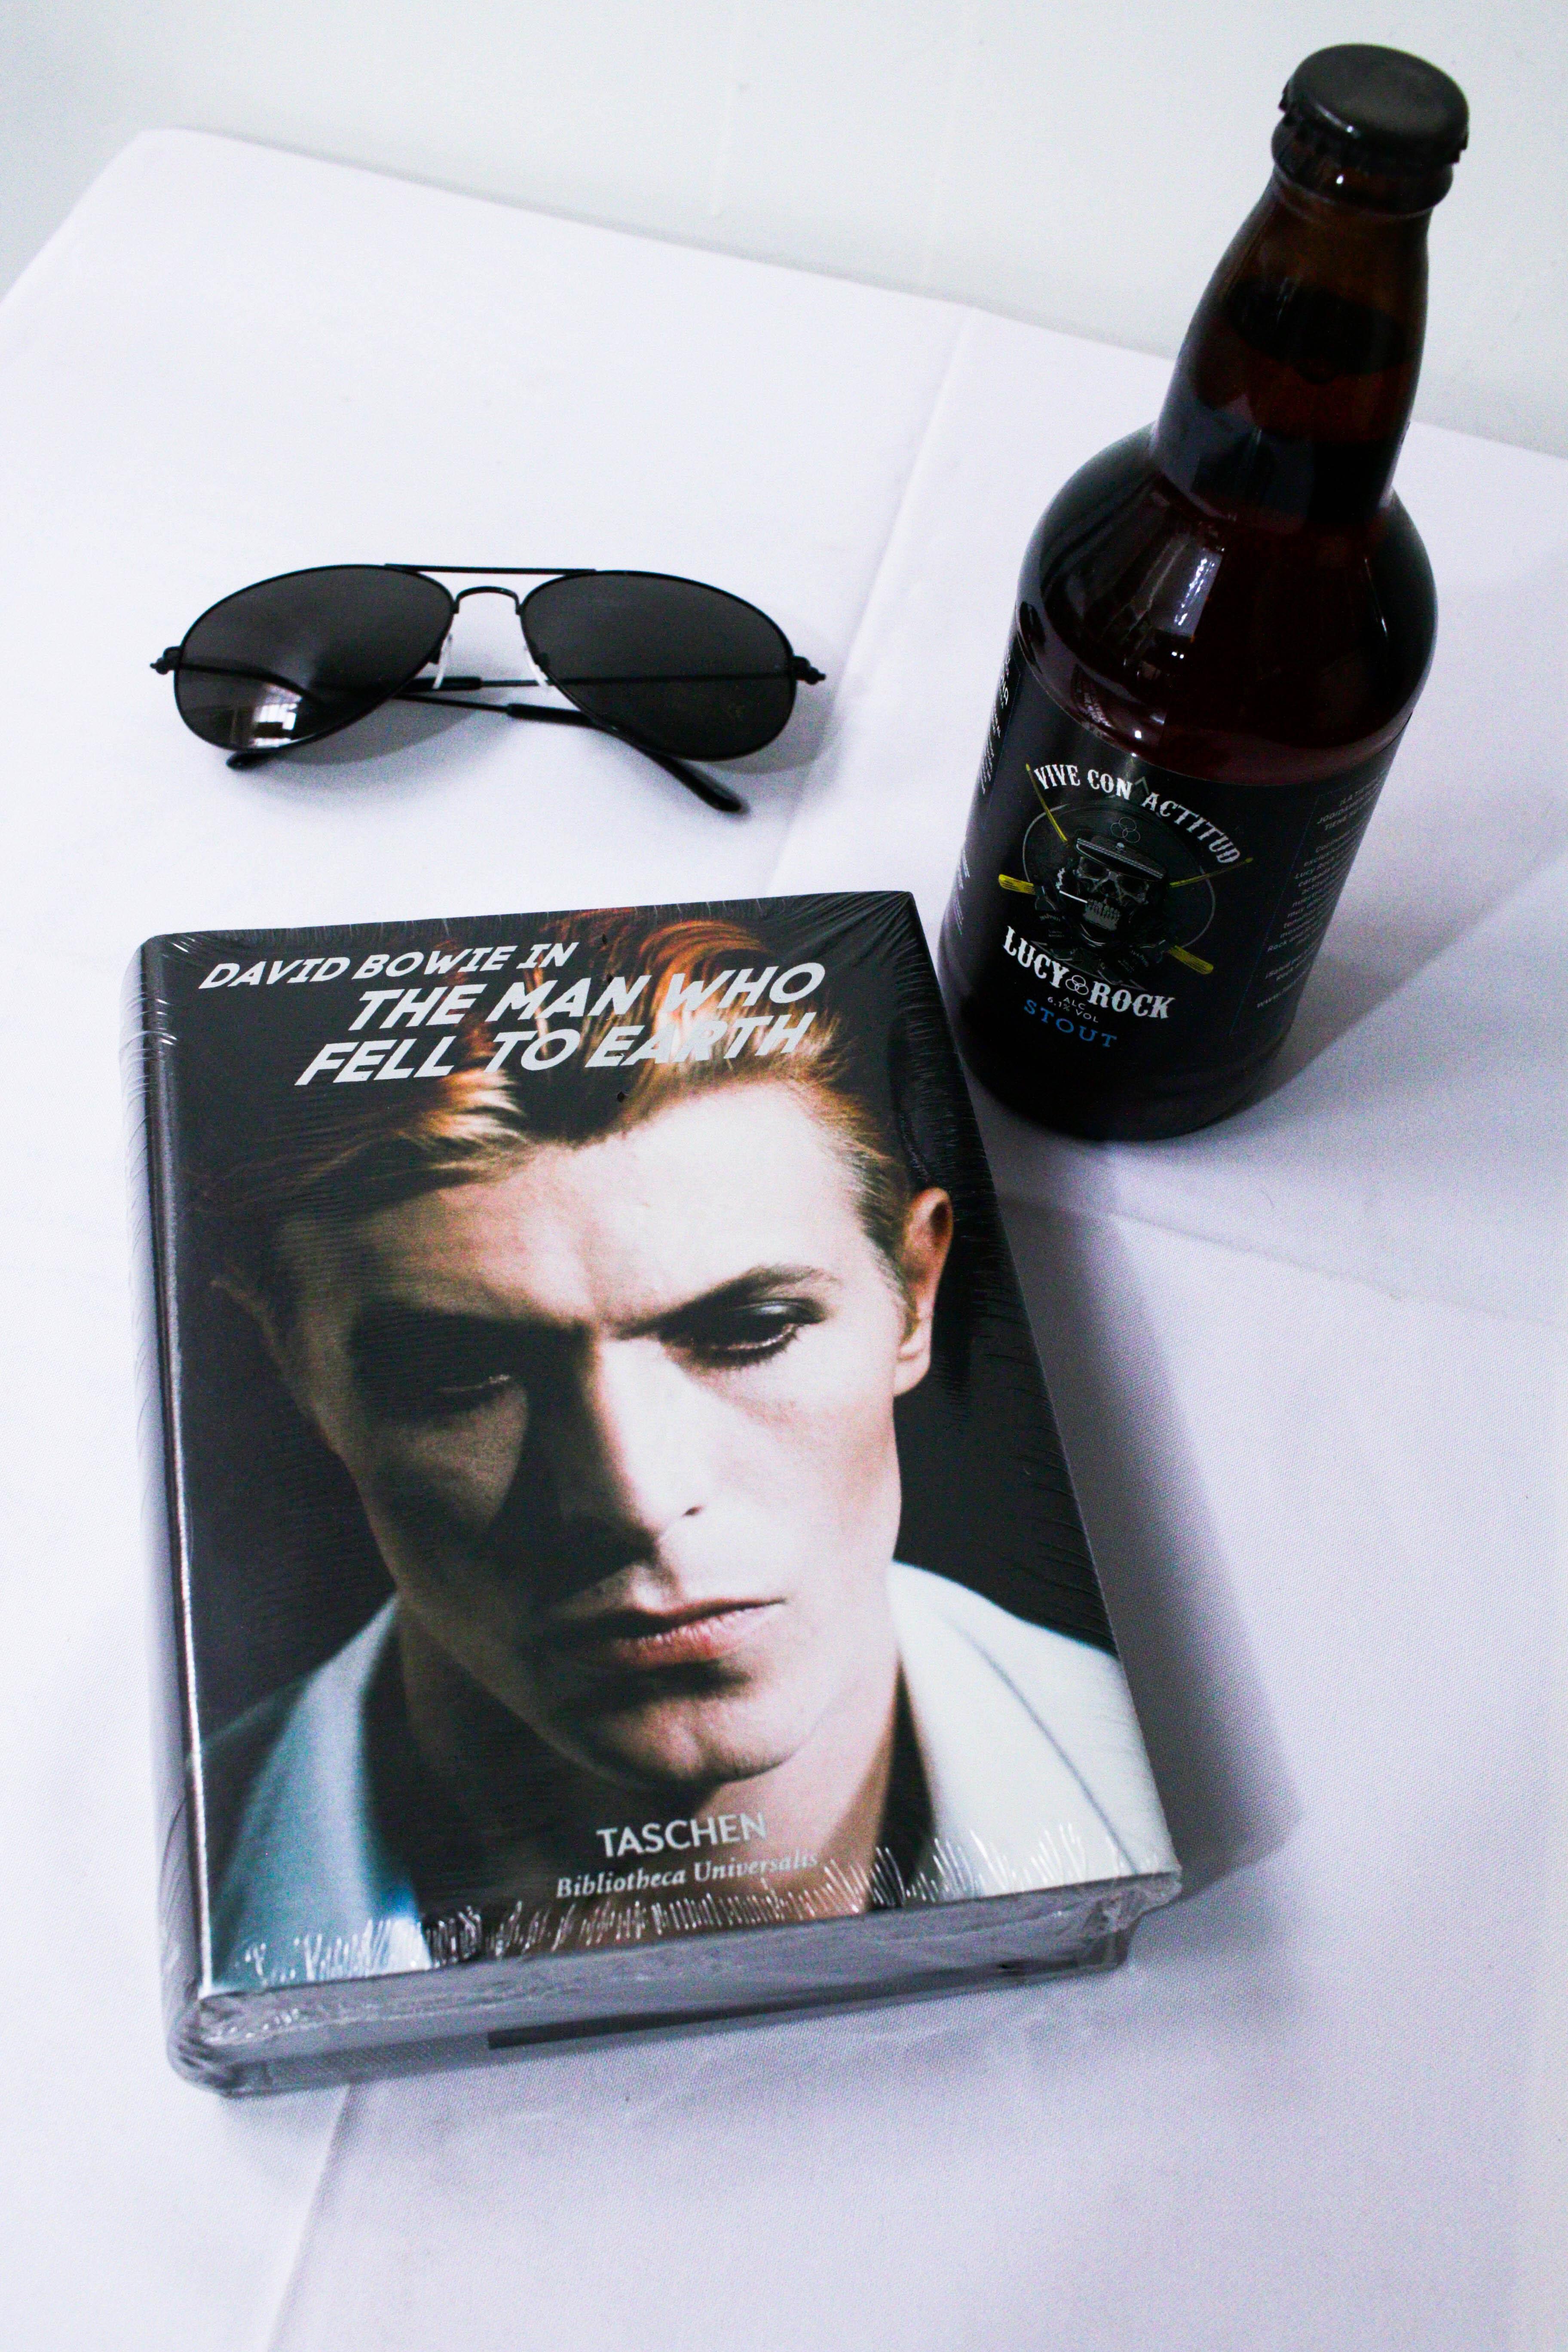 David Bowie, The Man Who Fell To Earth de Jean-Michel Guesdon